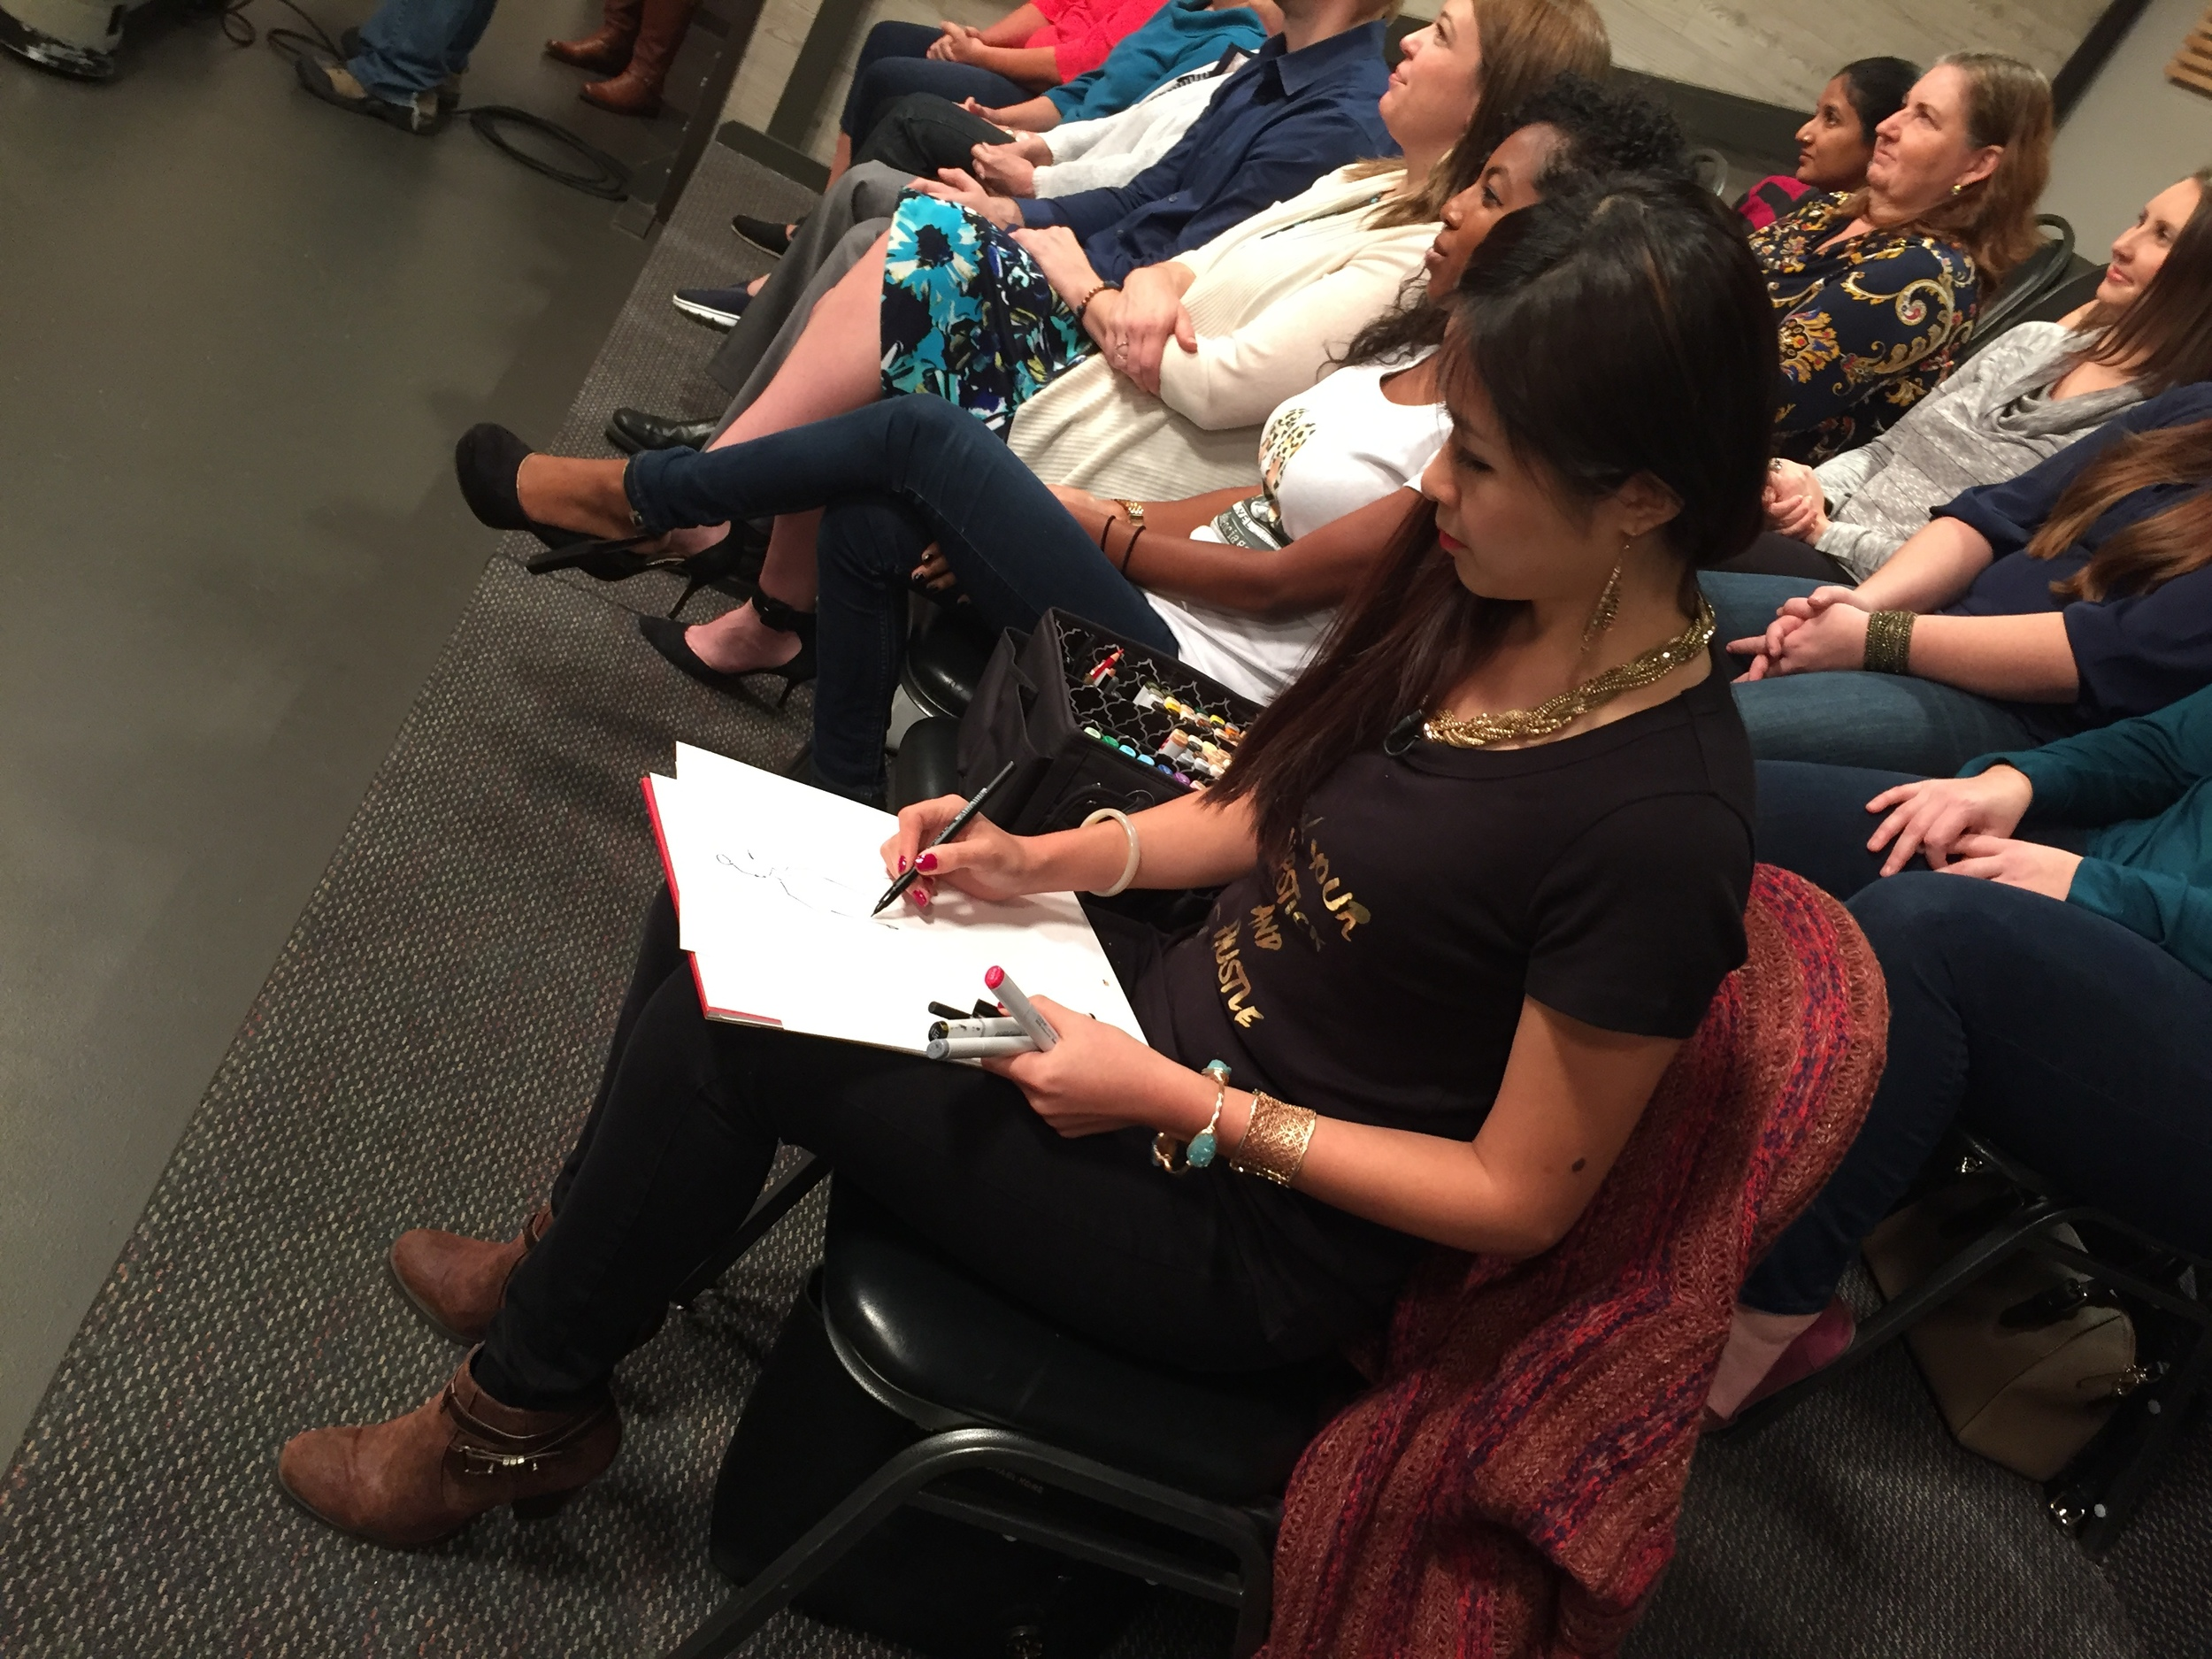 Houston fashion illustrator live sketch at Great Day Houston-6